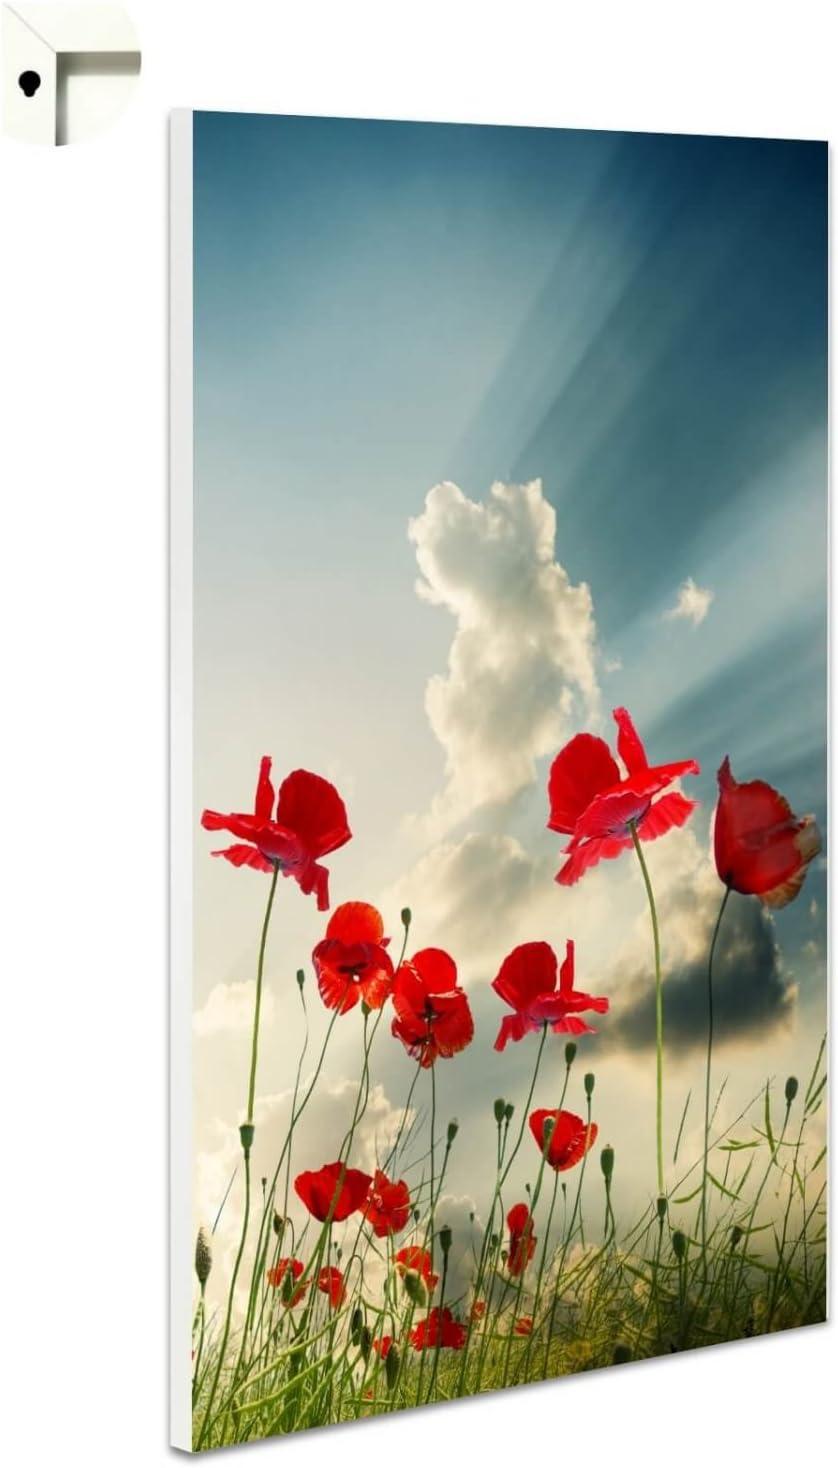 Magnettafel Pinnwand mit Motiv Natur Mohnblume Himmel Gr/ö/ße 60 x 80 cm